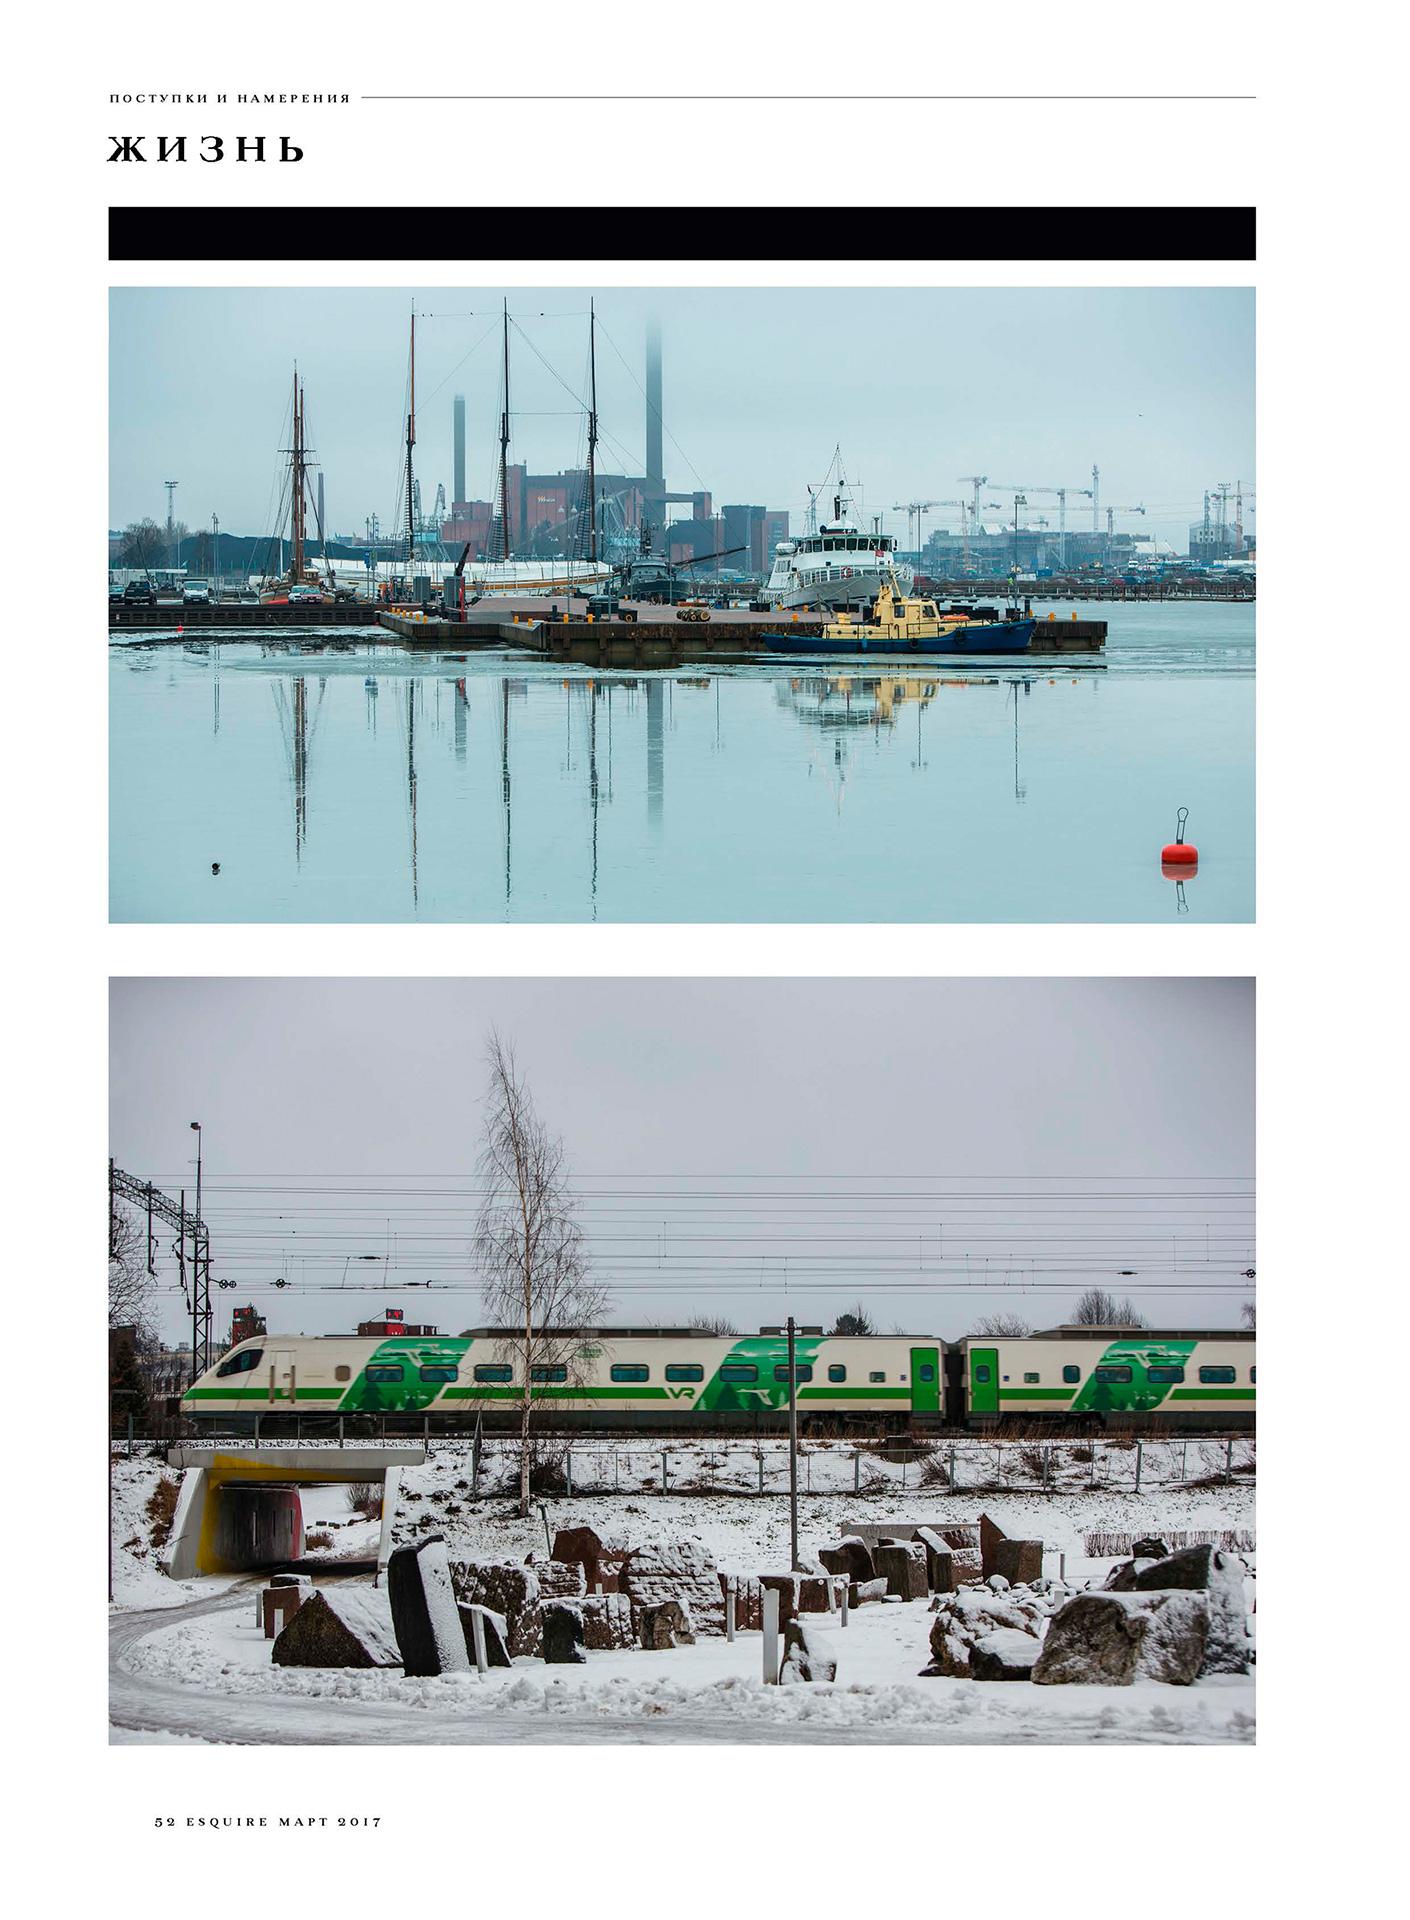 Esquire magazine, European, Finnish public transport, Suomi, Finland, Helsinki, Uusimaa